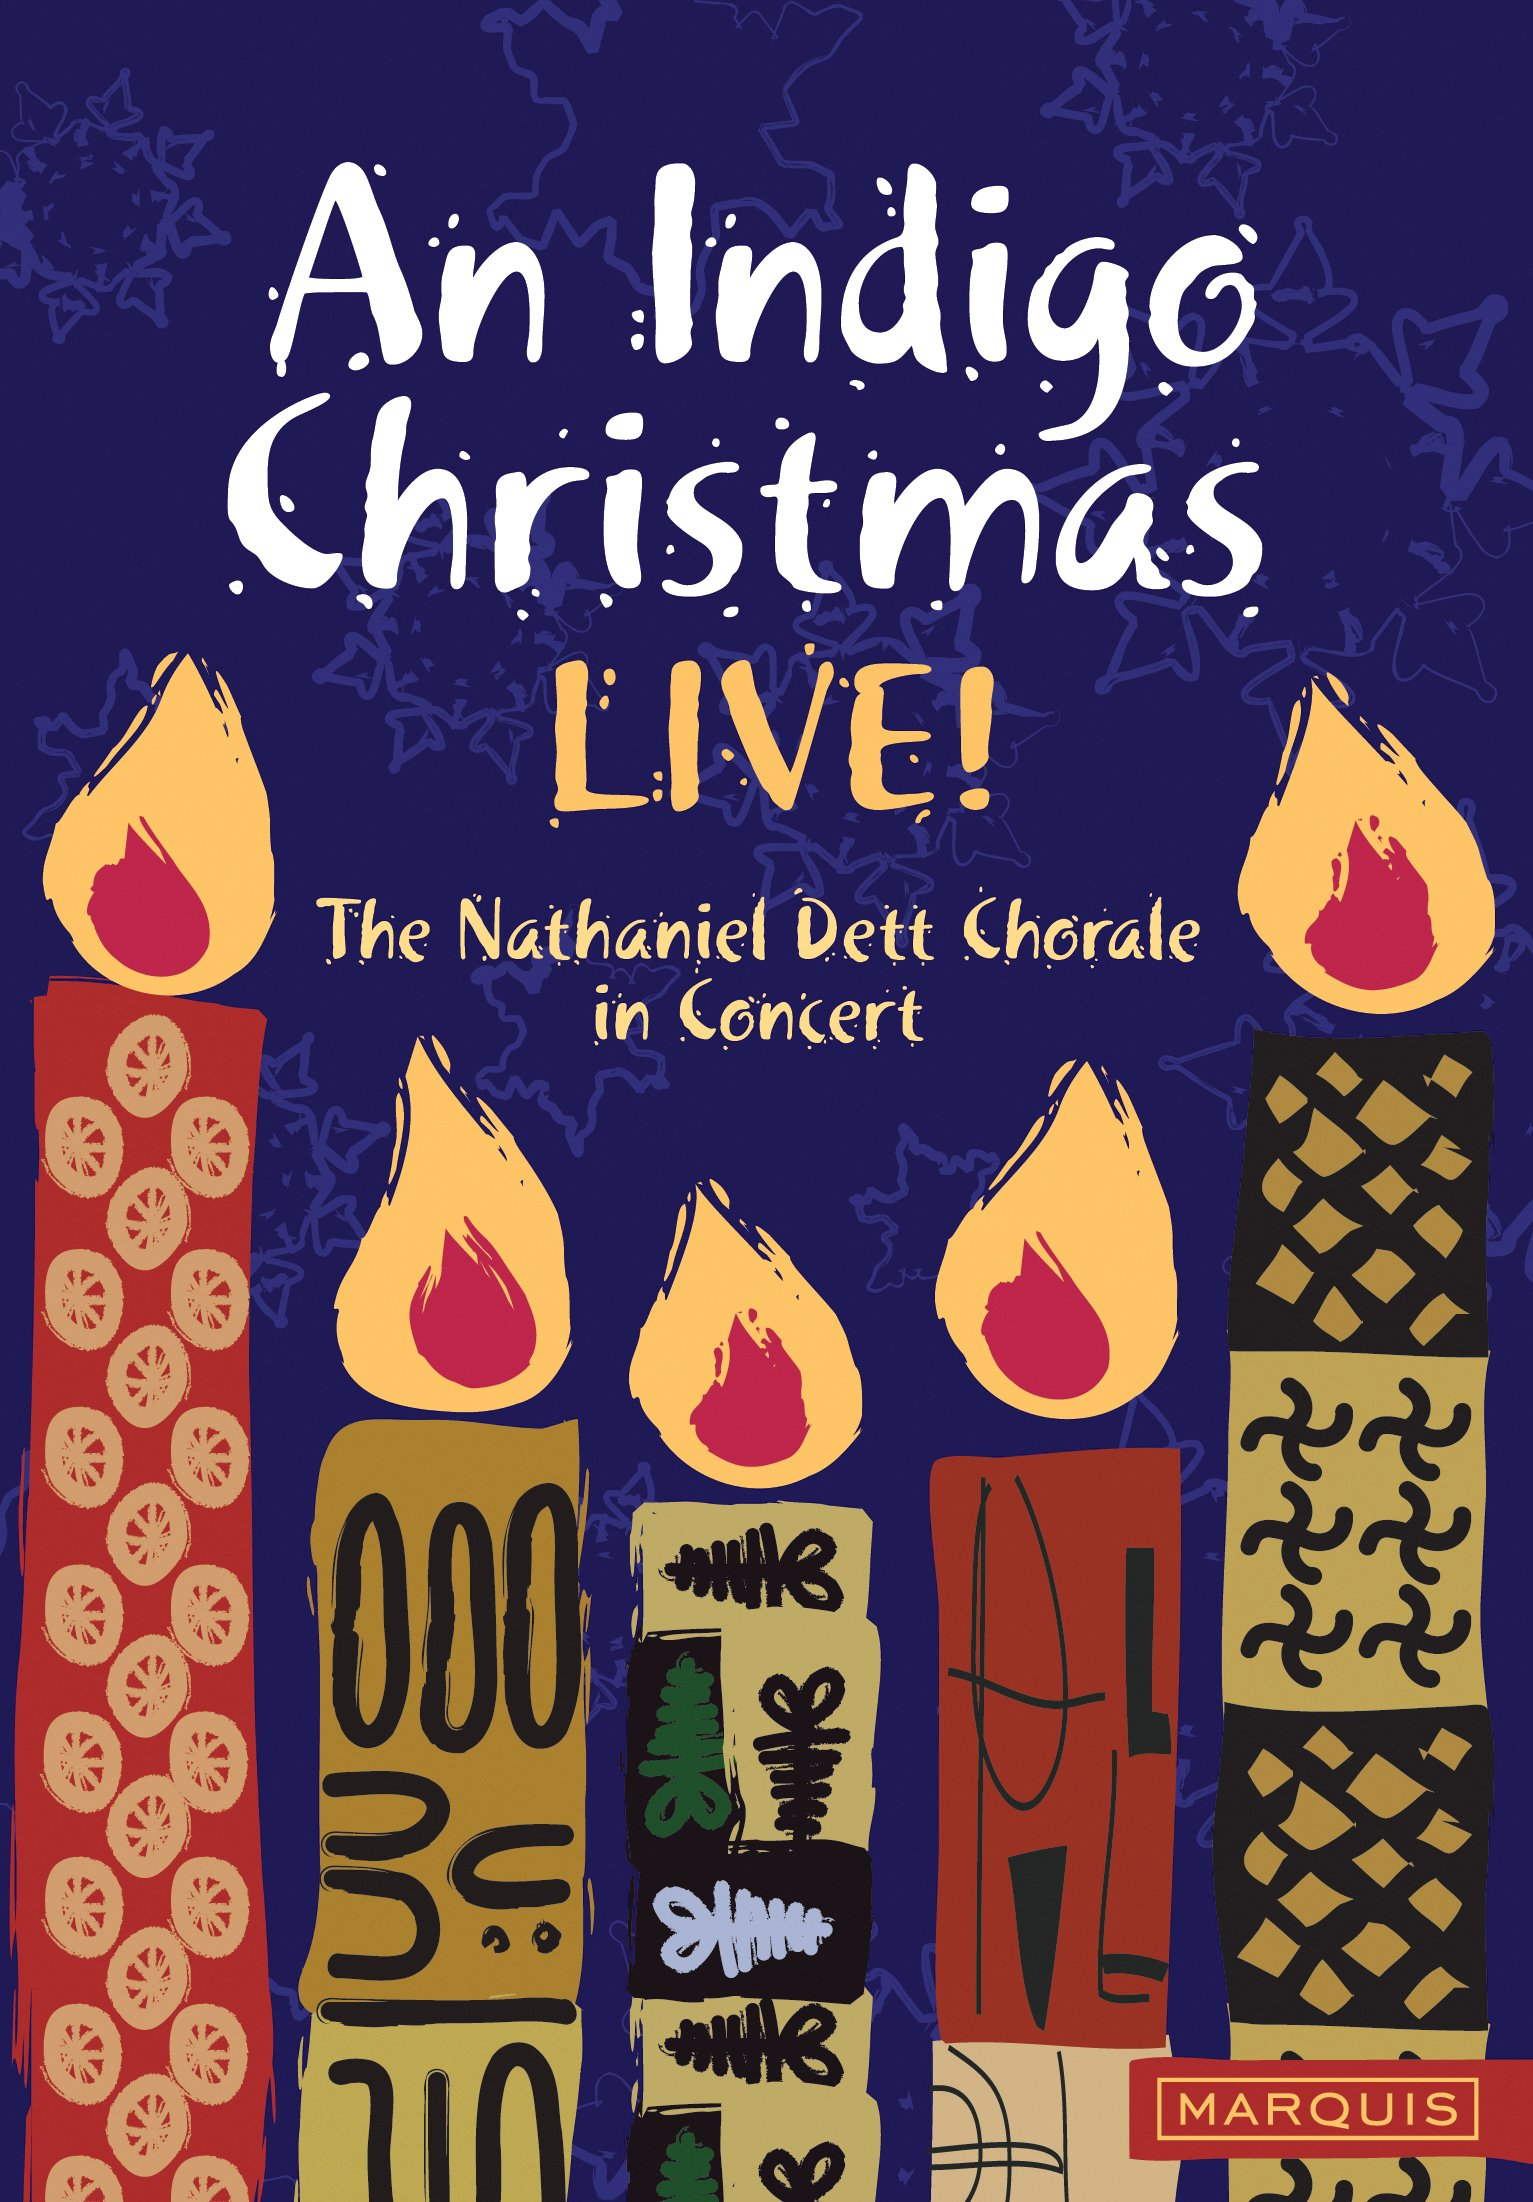 DVD : Christine Schafer - Christine Schafer: My Art Of Singing (DVD)